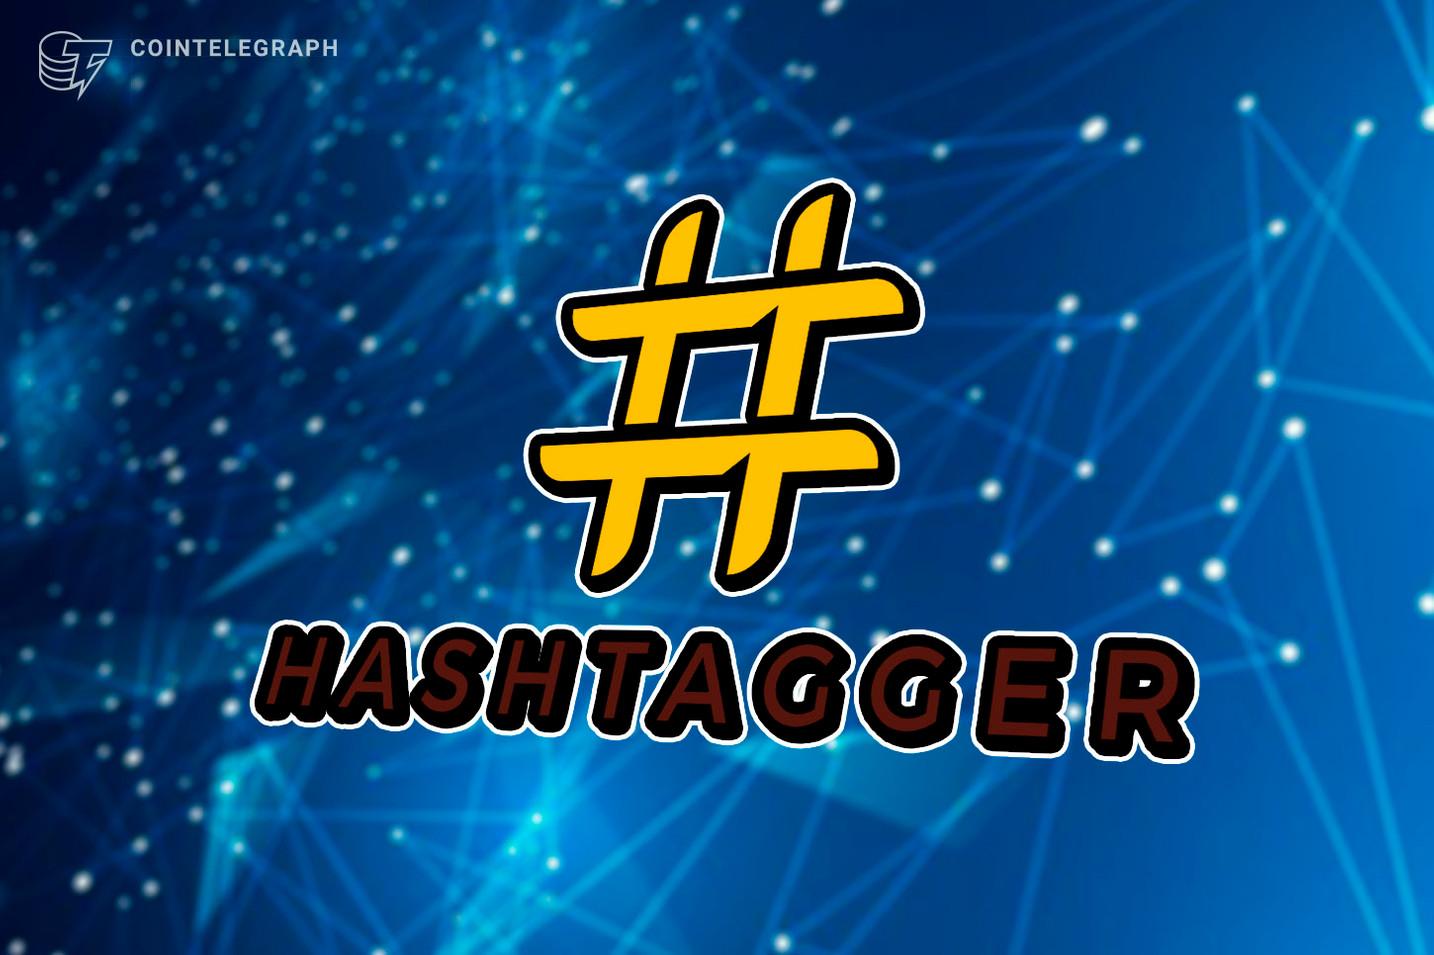 Hashtagger raises $250k led by NGC, CMS, Liquefy, GBV and Spark Digital